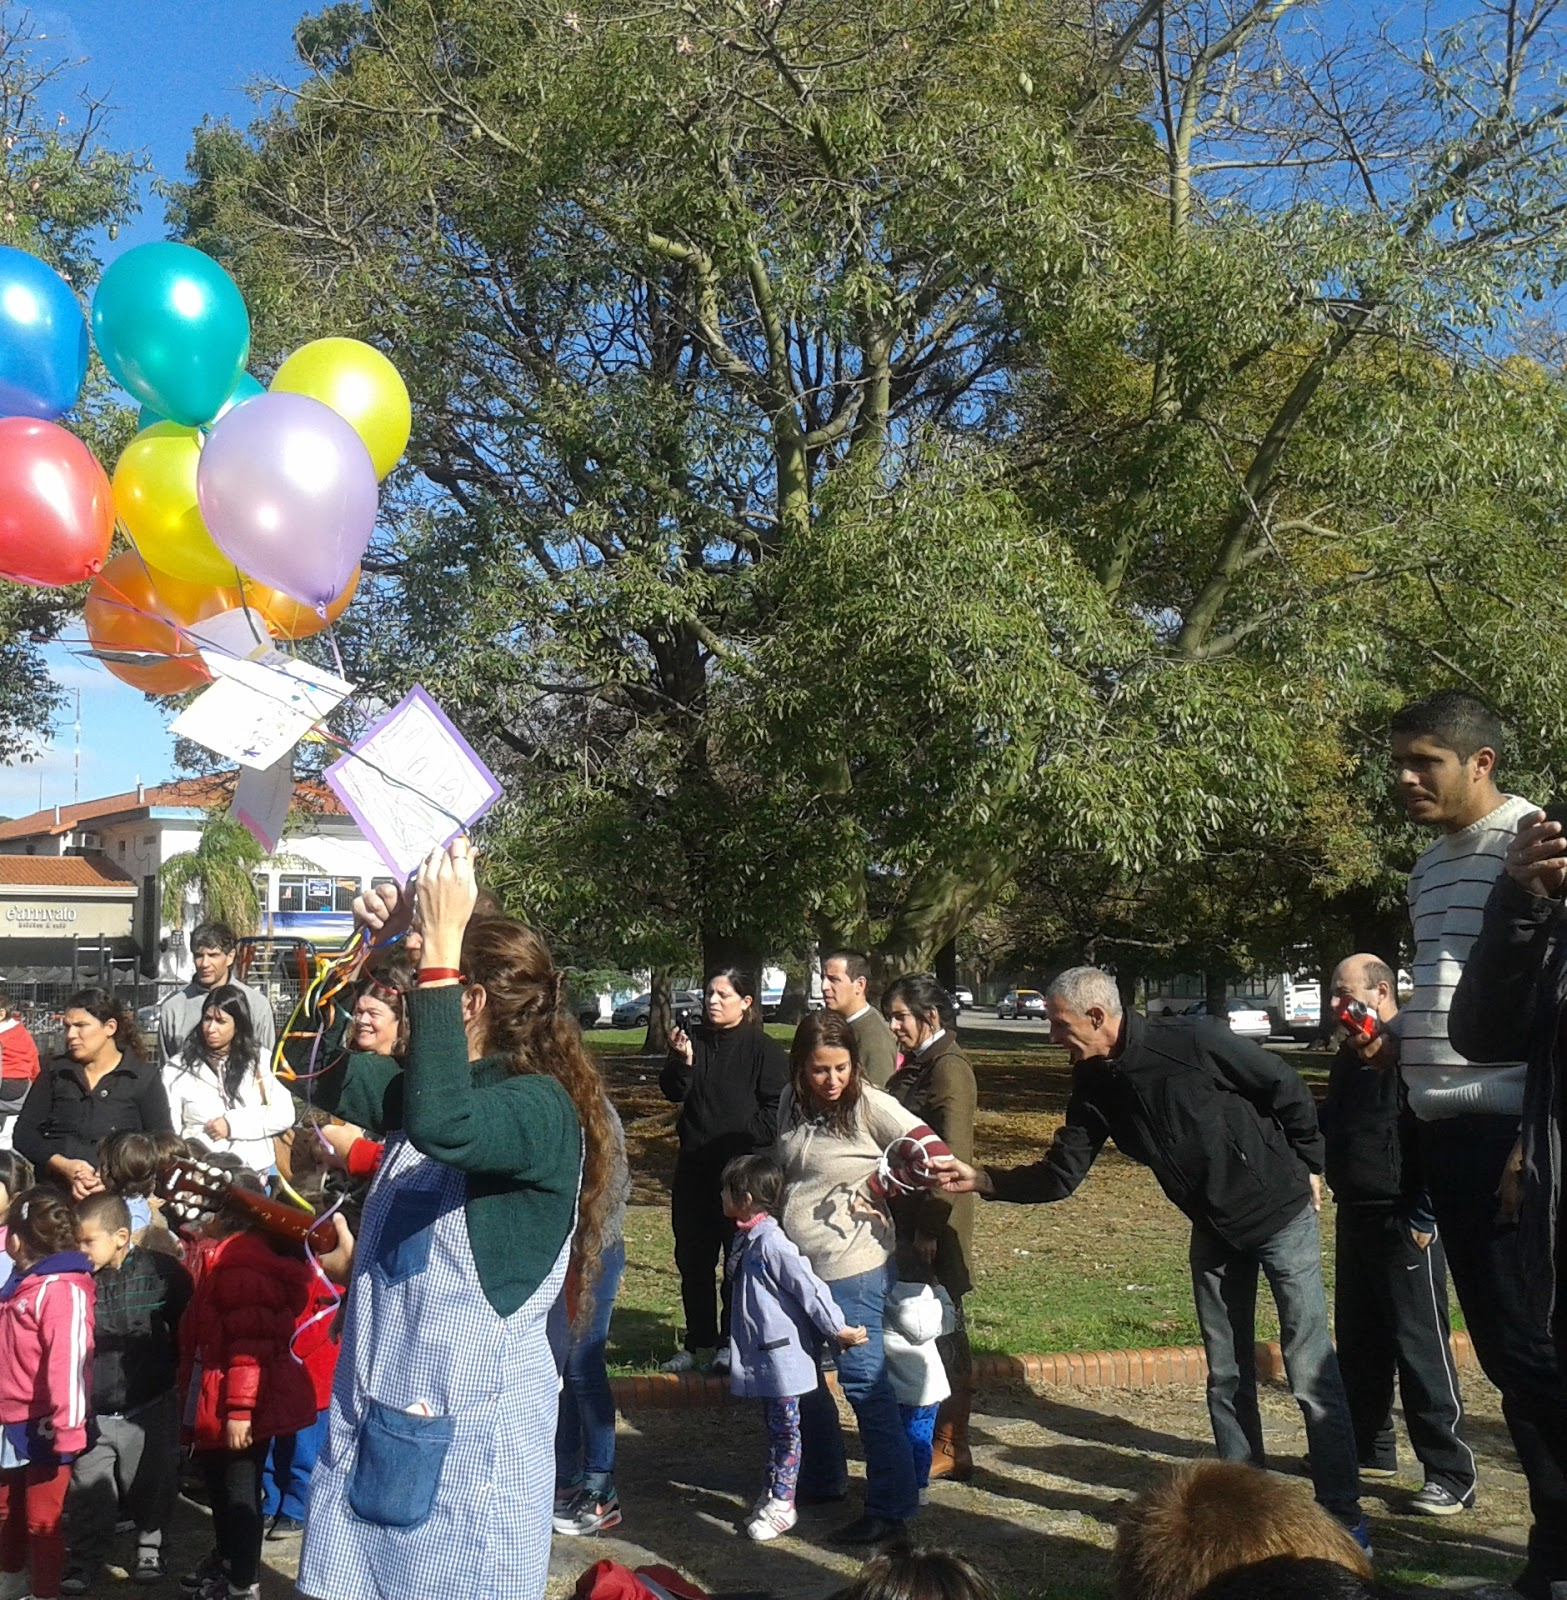 Jard n del parque 31 05 15 7 06 15 for Jardin de infantes 2015